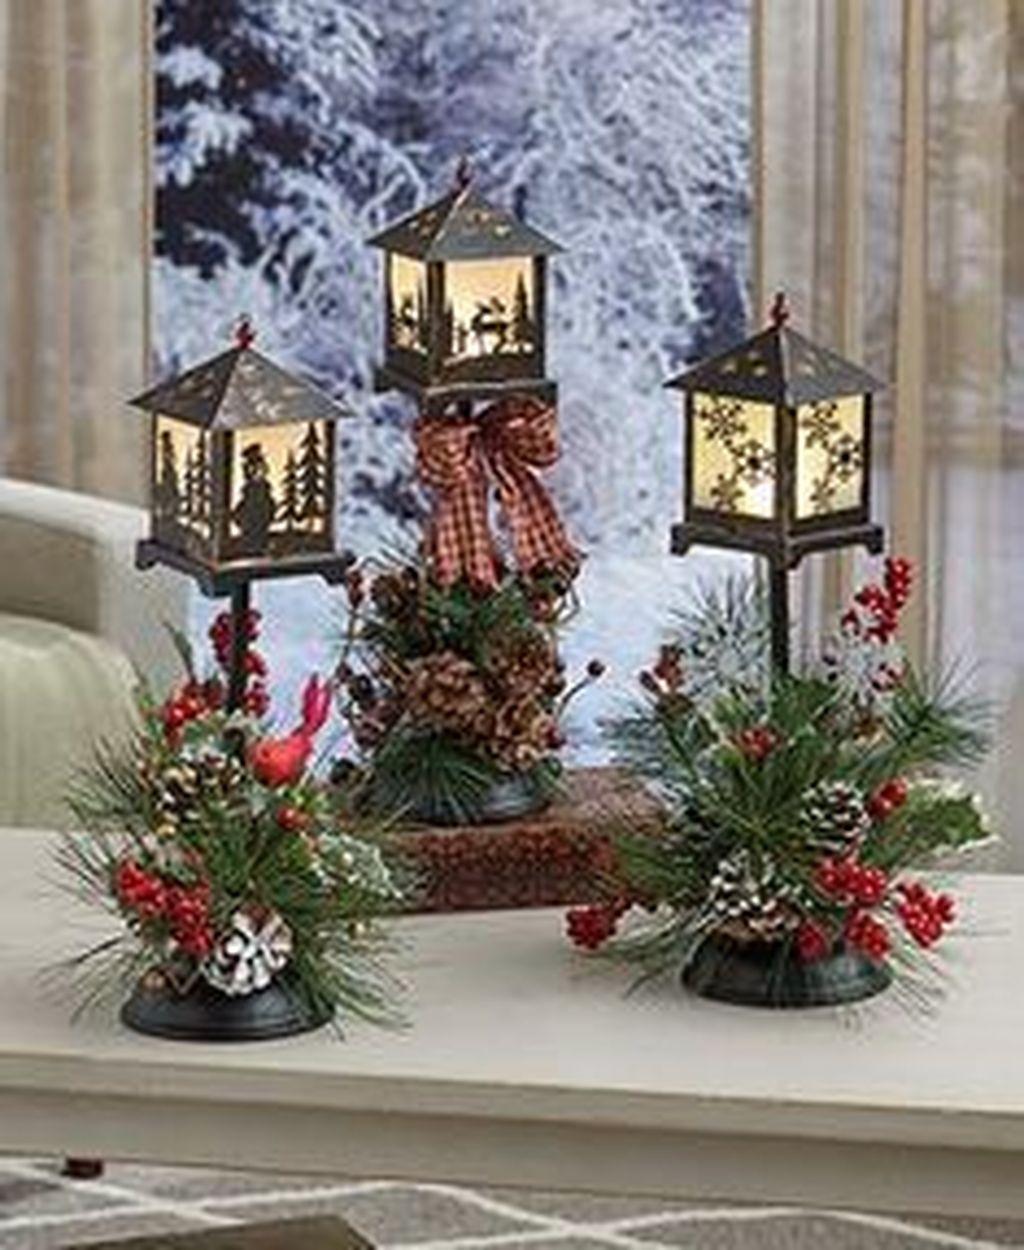 Fabulous Winter Lantern Centerpieces Ideas 33 Pimphomee